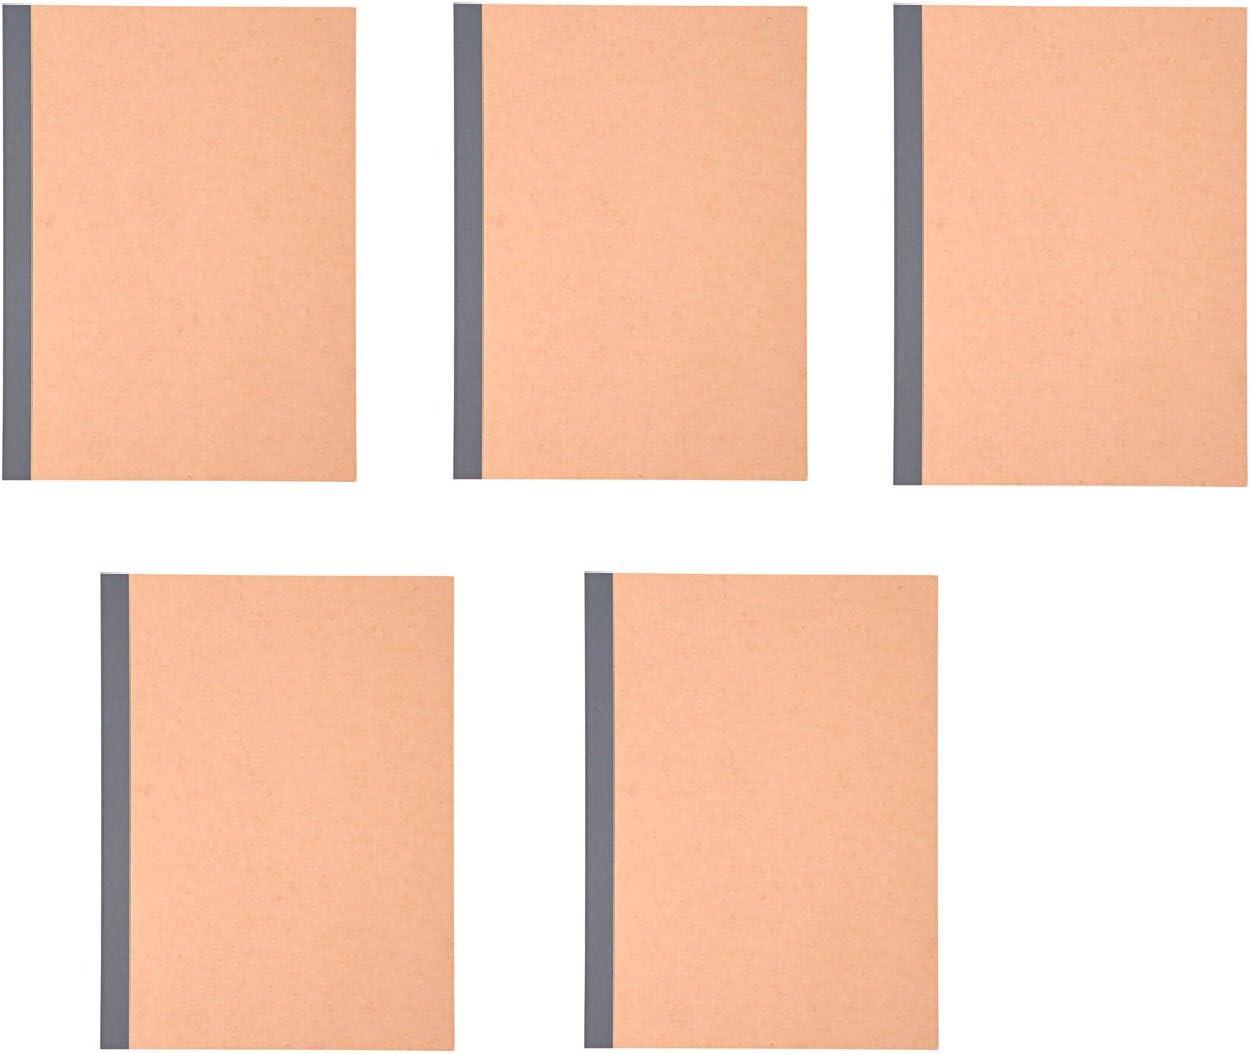 MoMa MUJI Notebook B5 6㎜ 30sheets Pack of 5books